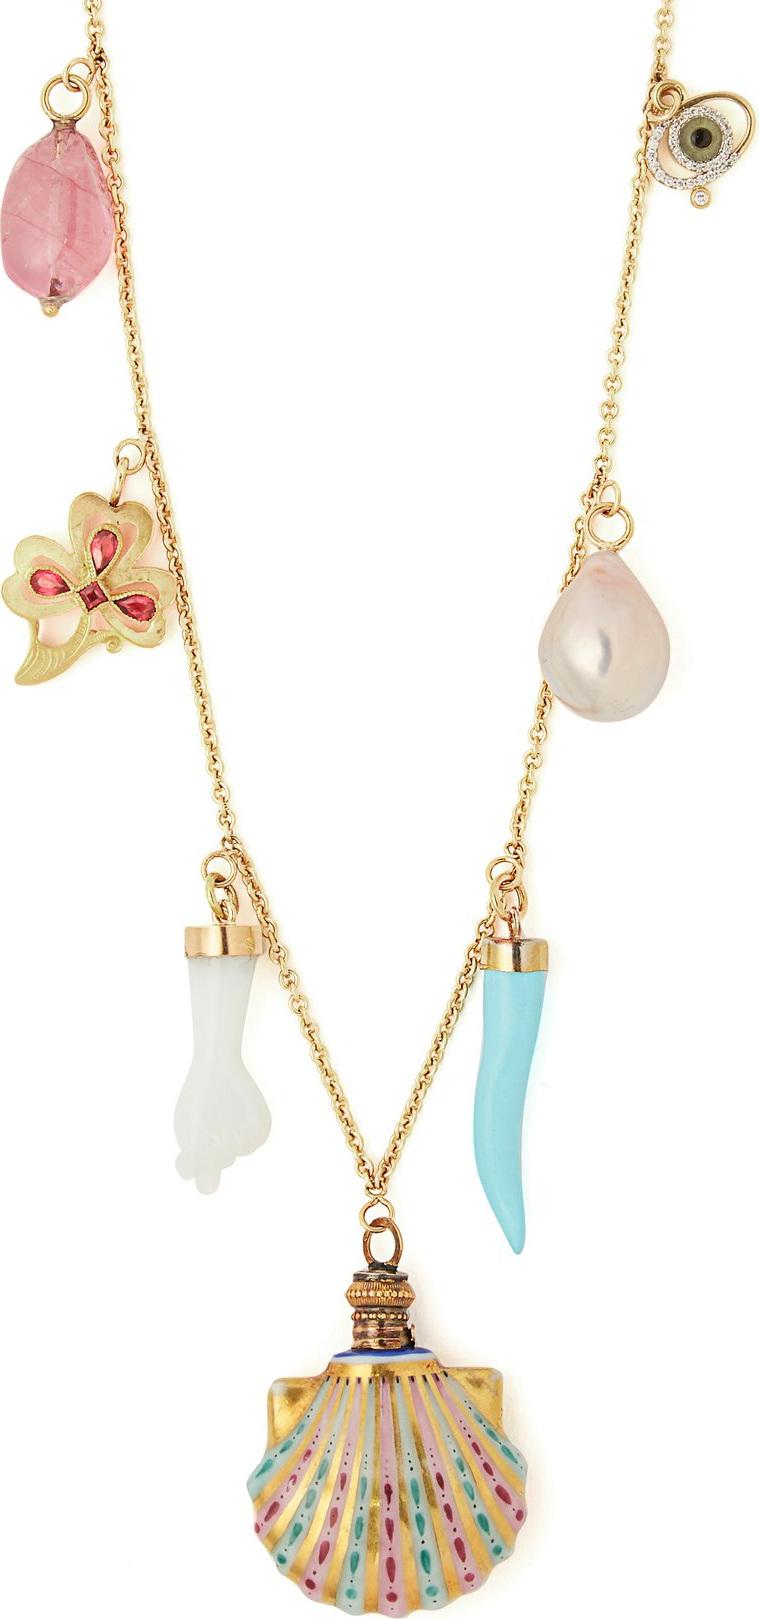 Brigid Blanco - 18kt gold charm necklace